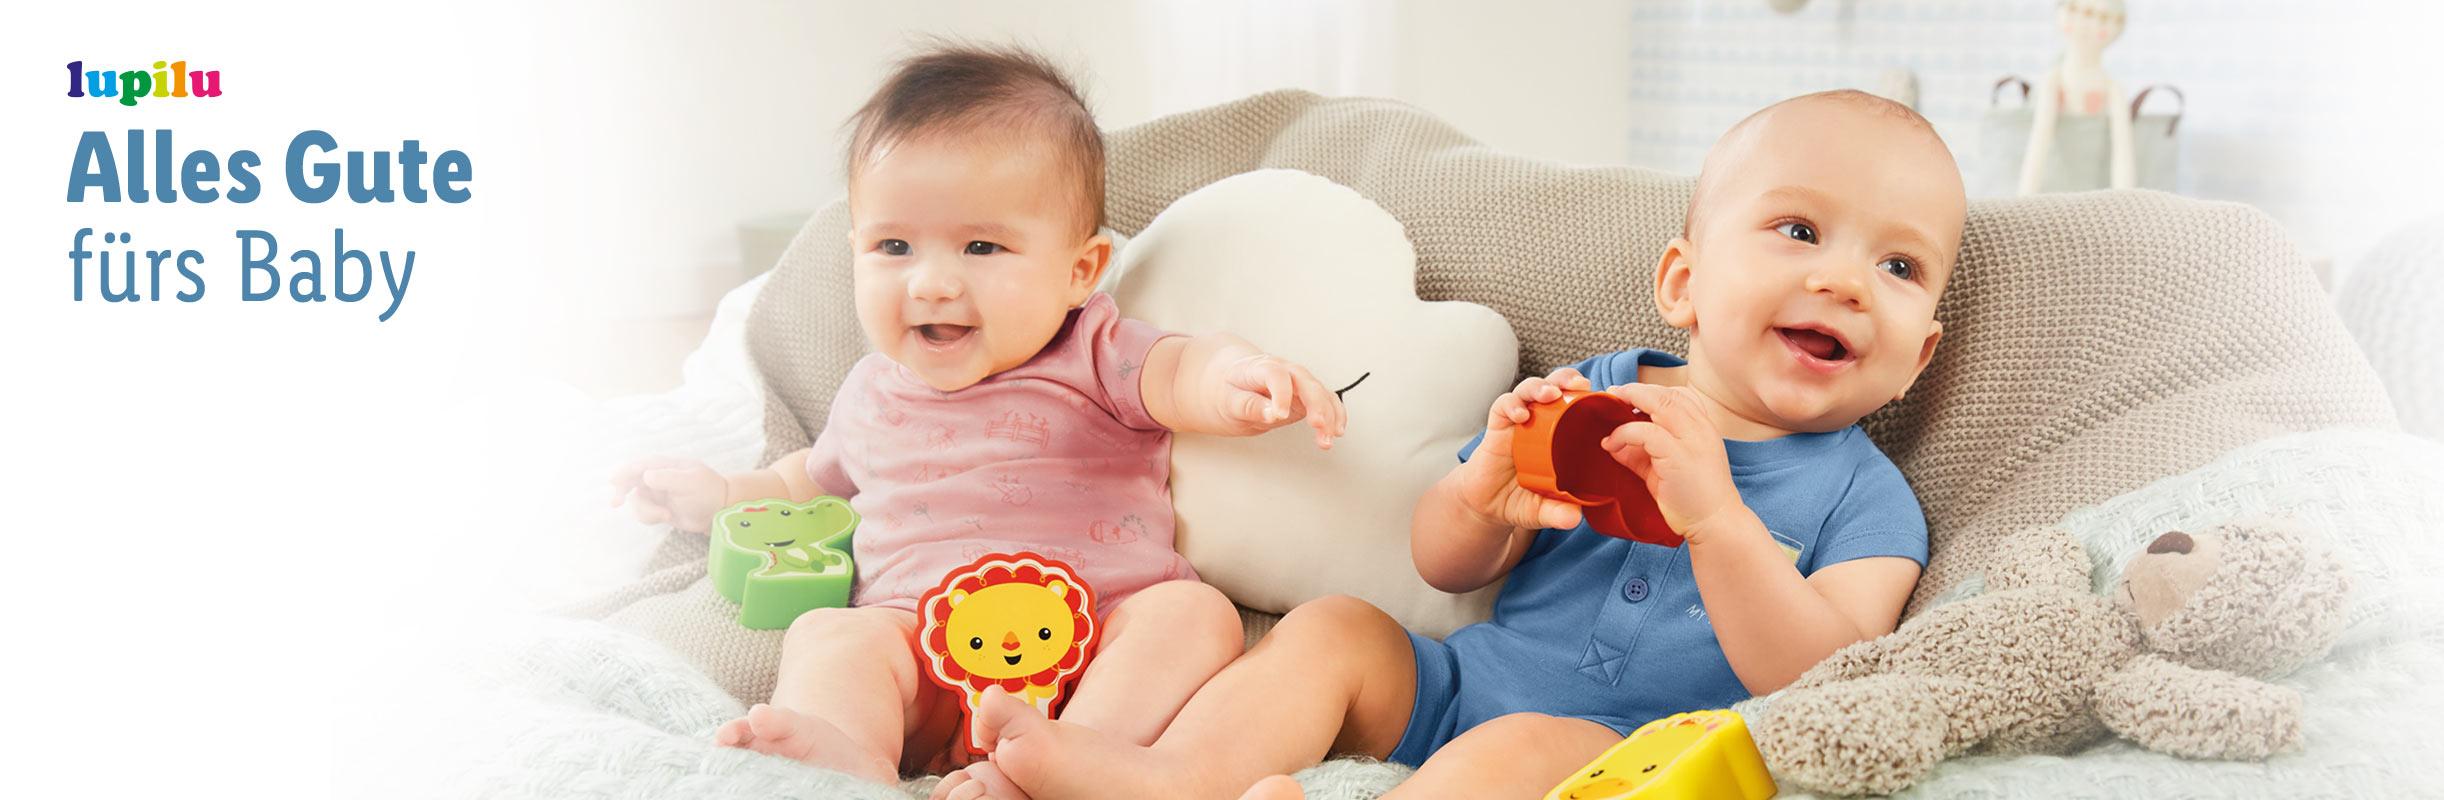 Lidl Baby Kollektion LUPILU